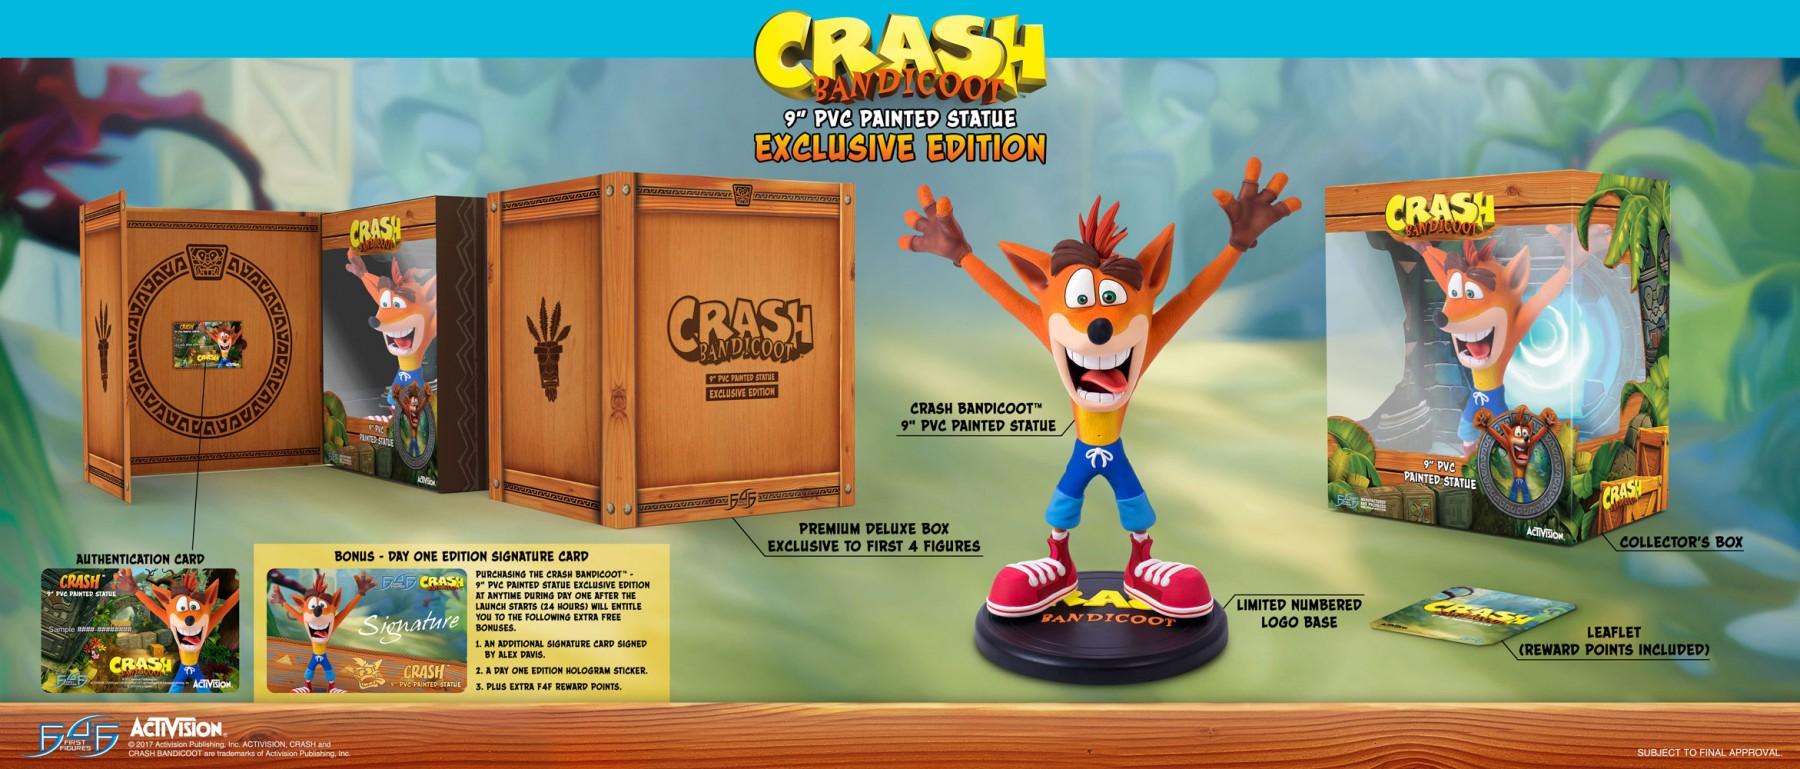 crash bandicoot exclusive